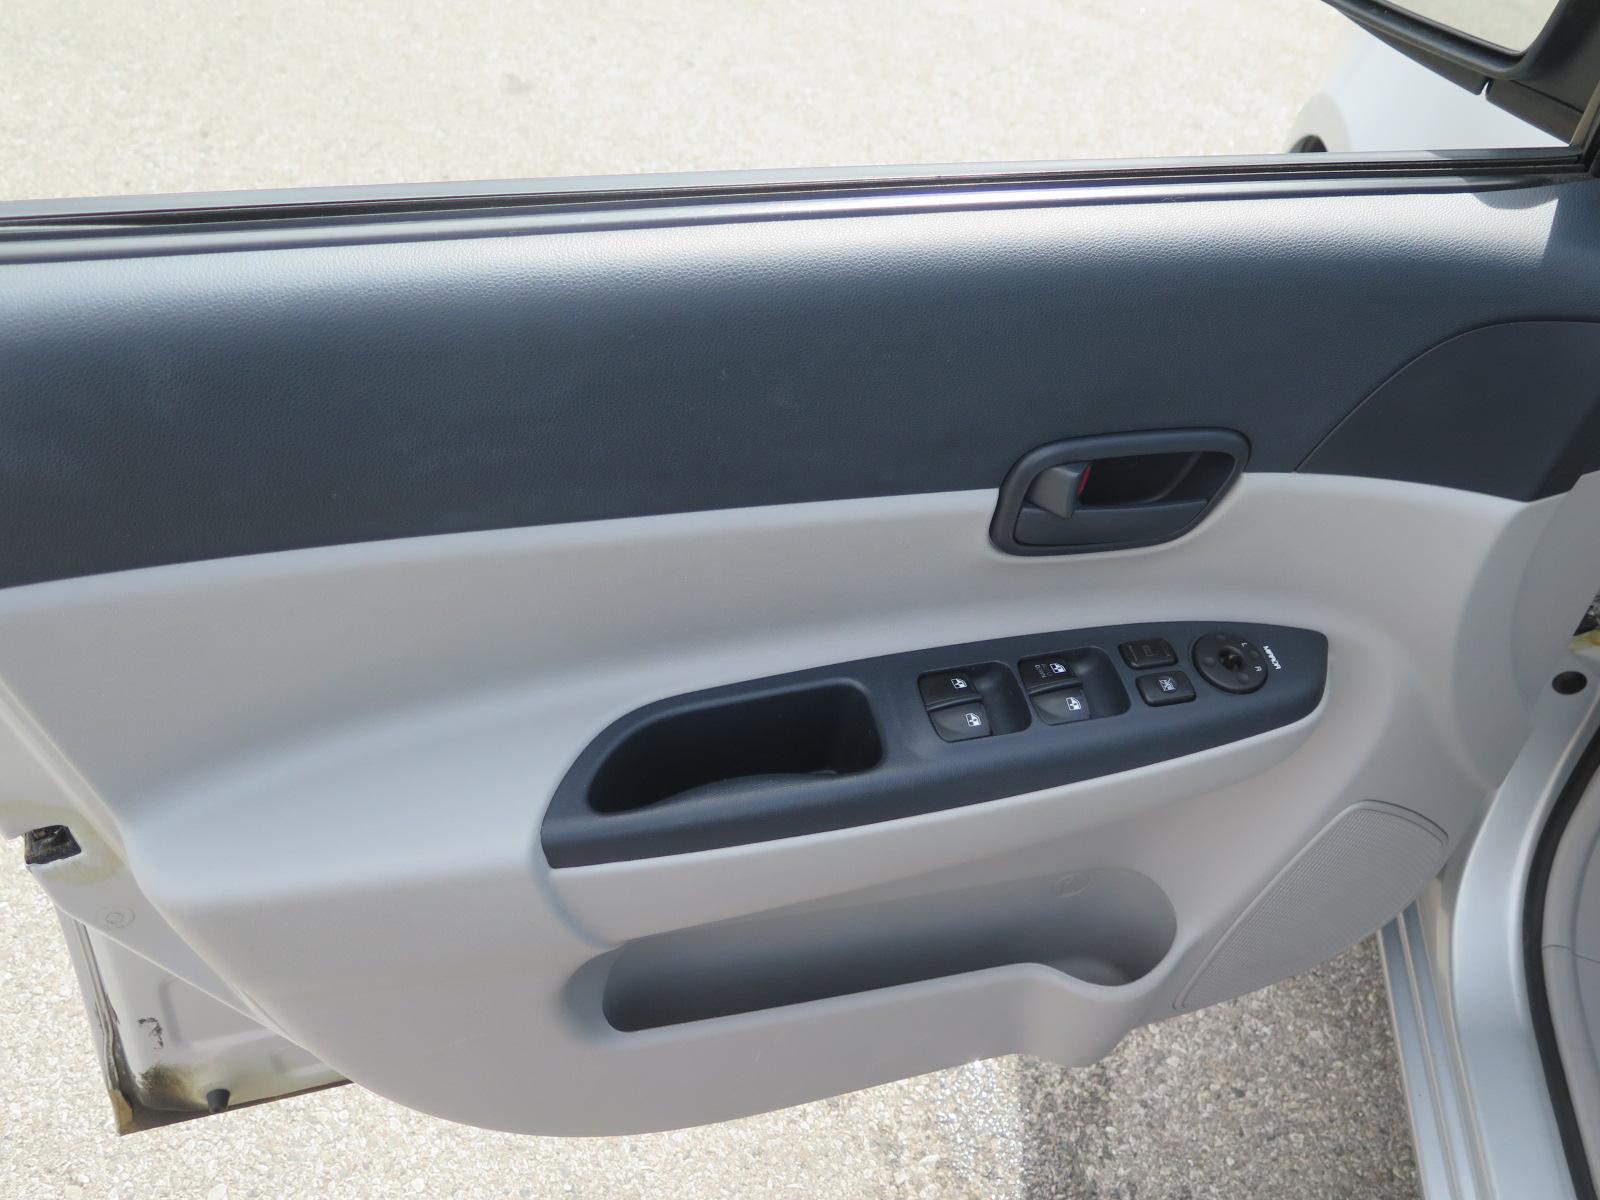 Used 2006 Hyundai Accent , $3150